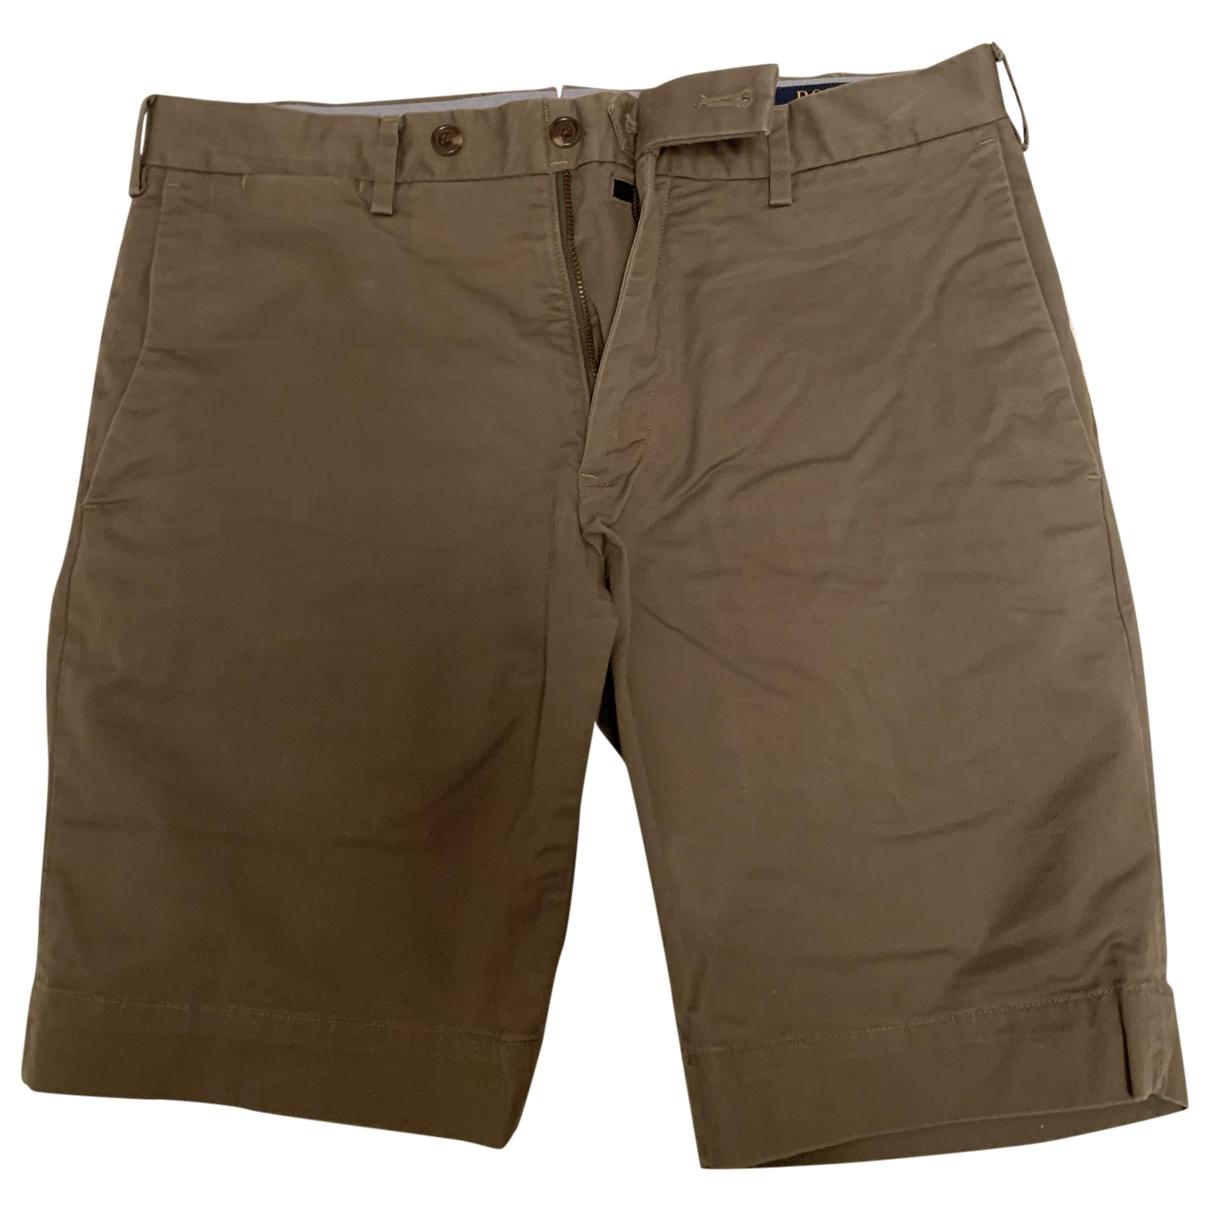 Polo Ralph Lauren \N Khaki Cotton Shorts for Men 30 UK - US